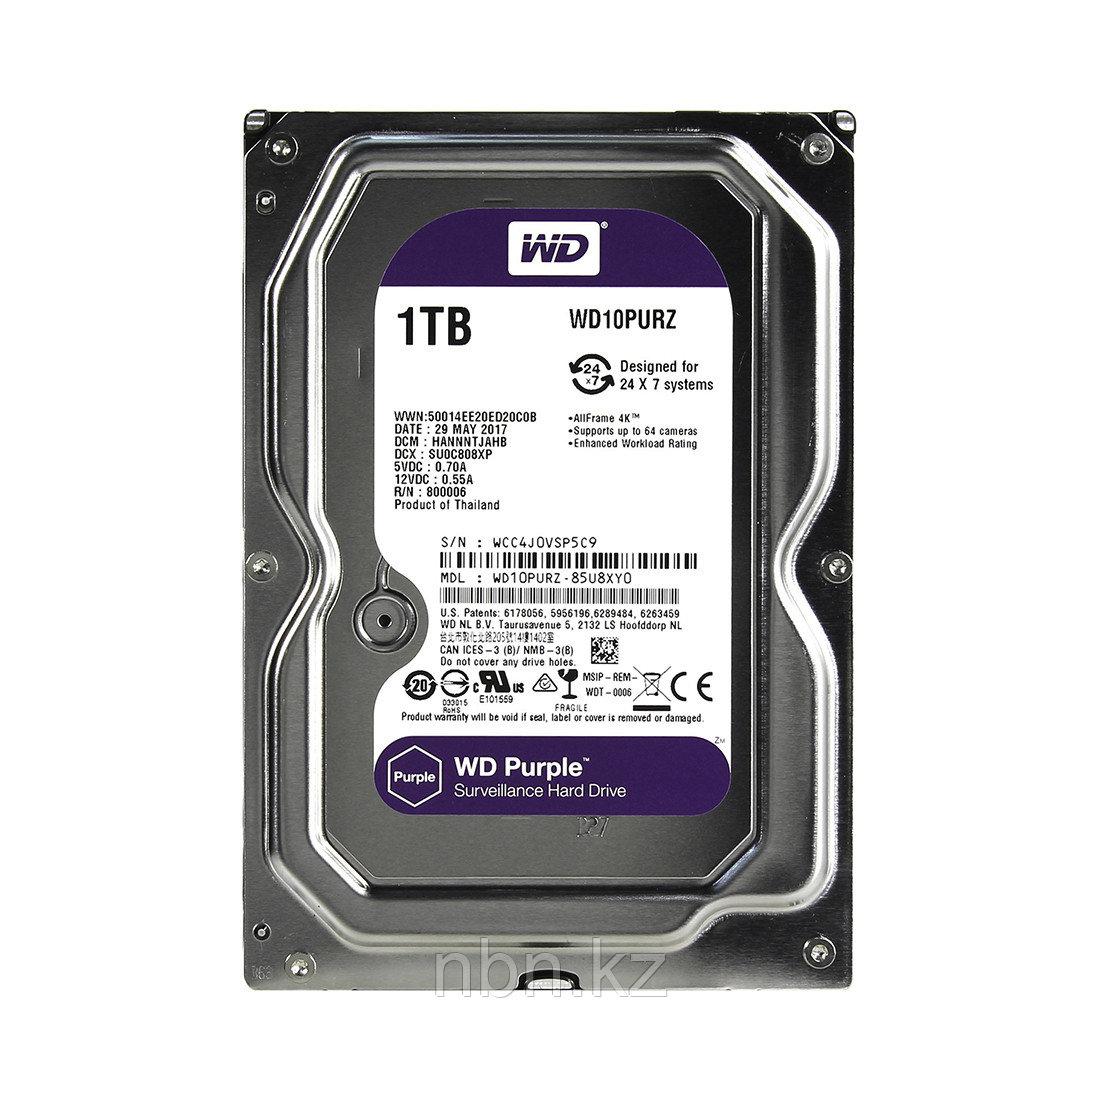 Жёсткий диск для видеонаблюдения Western Digital Purple HDD 1Tb WD10PURZ